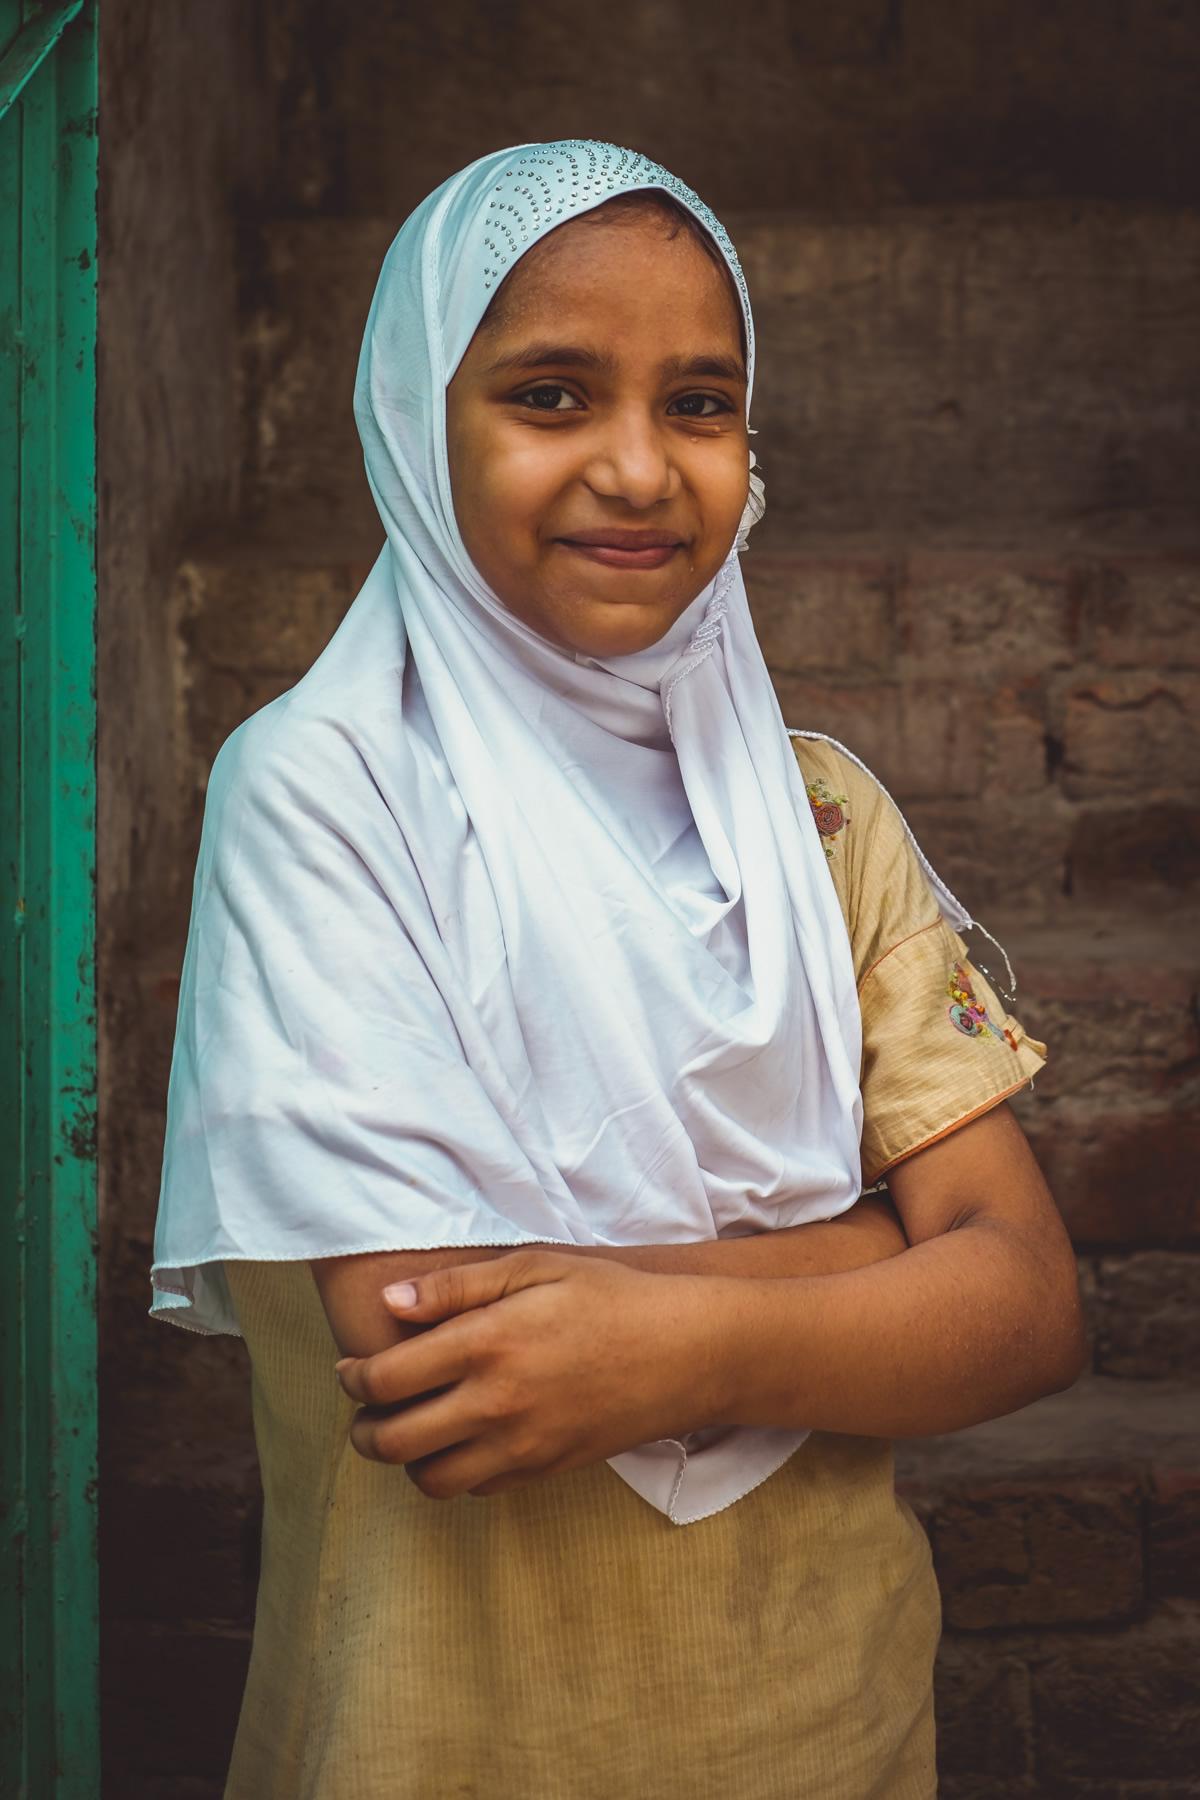 Pakistan, Lahore, travel photography, street photography, street portraits, nathan brayshaw,